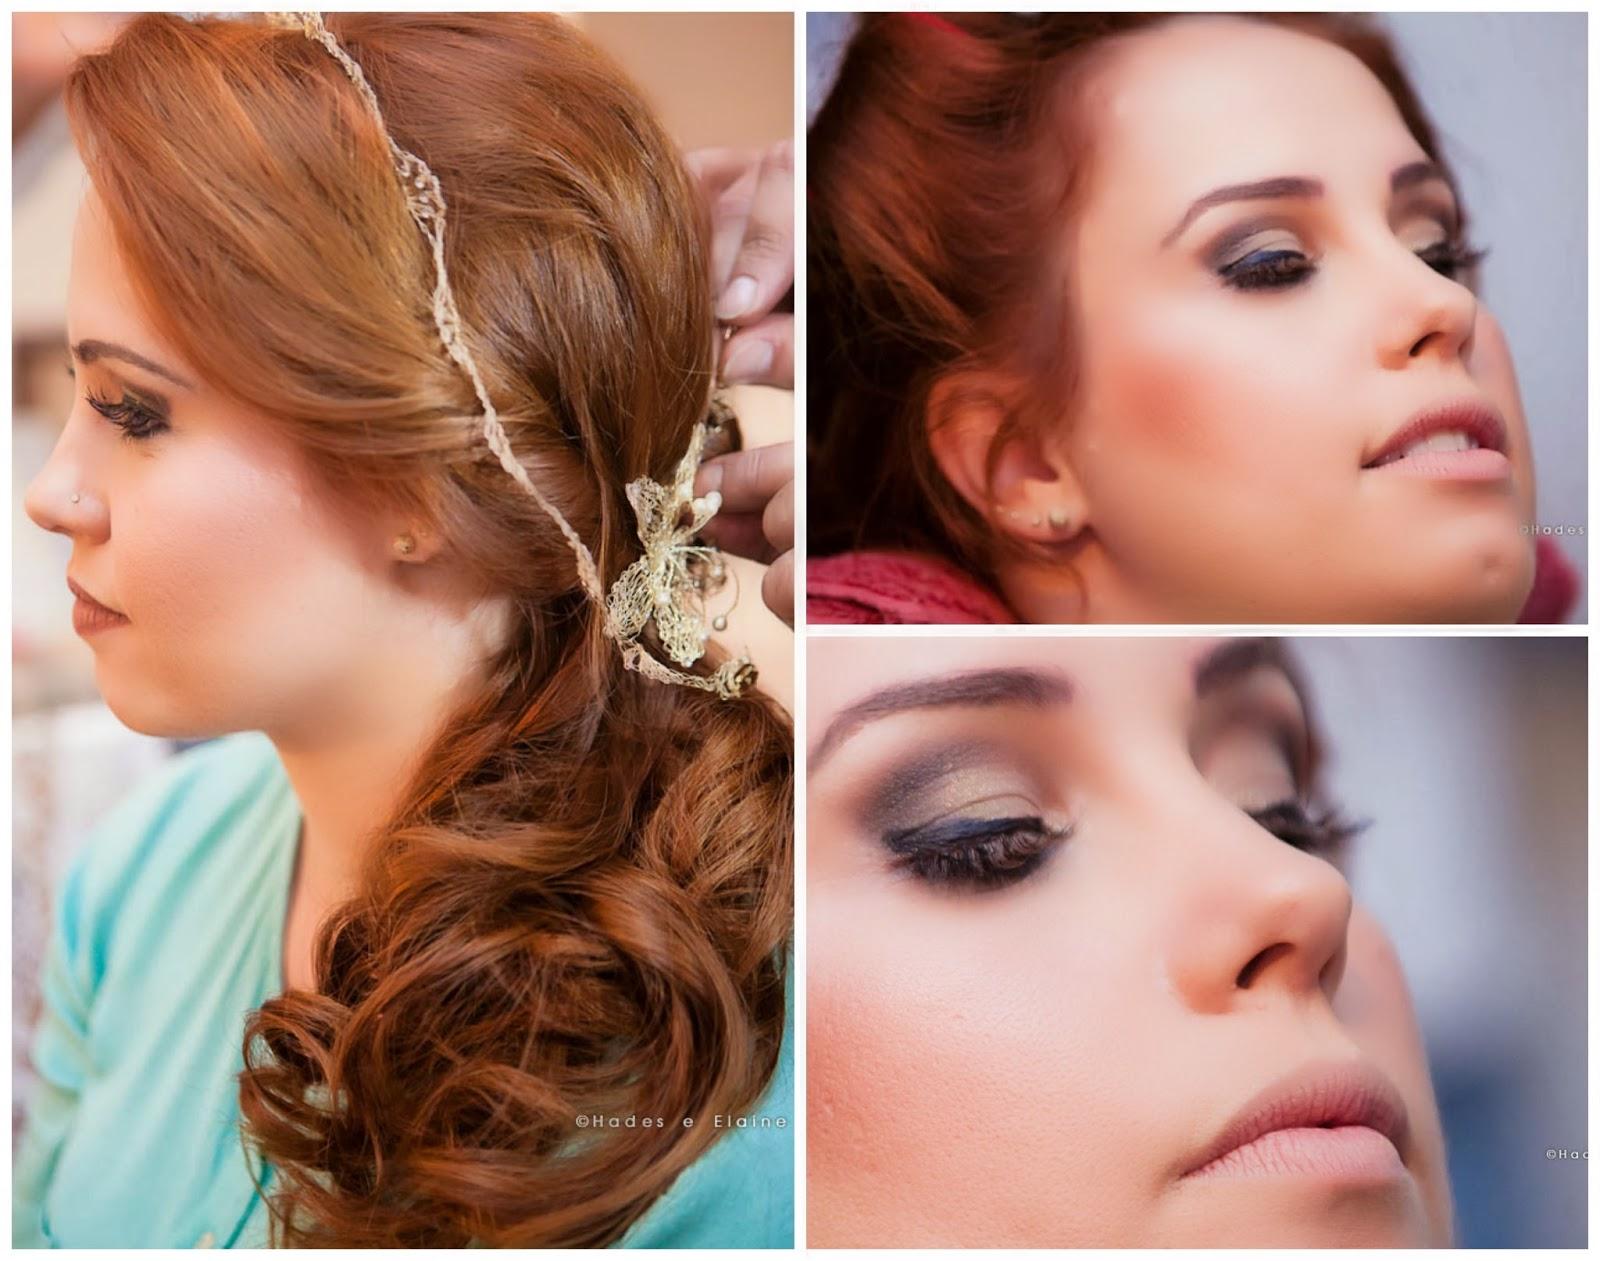 making of da noiva - dia da noiva - making of - noiva - make - cabelo - penteado - acessórios - tiara